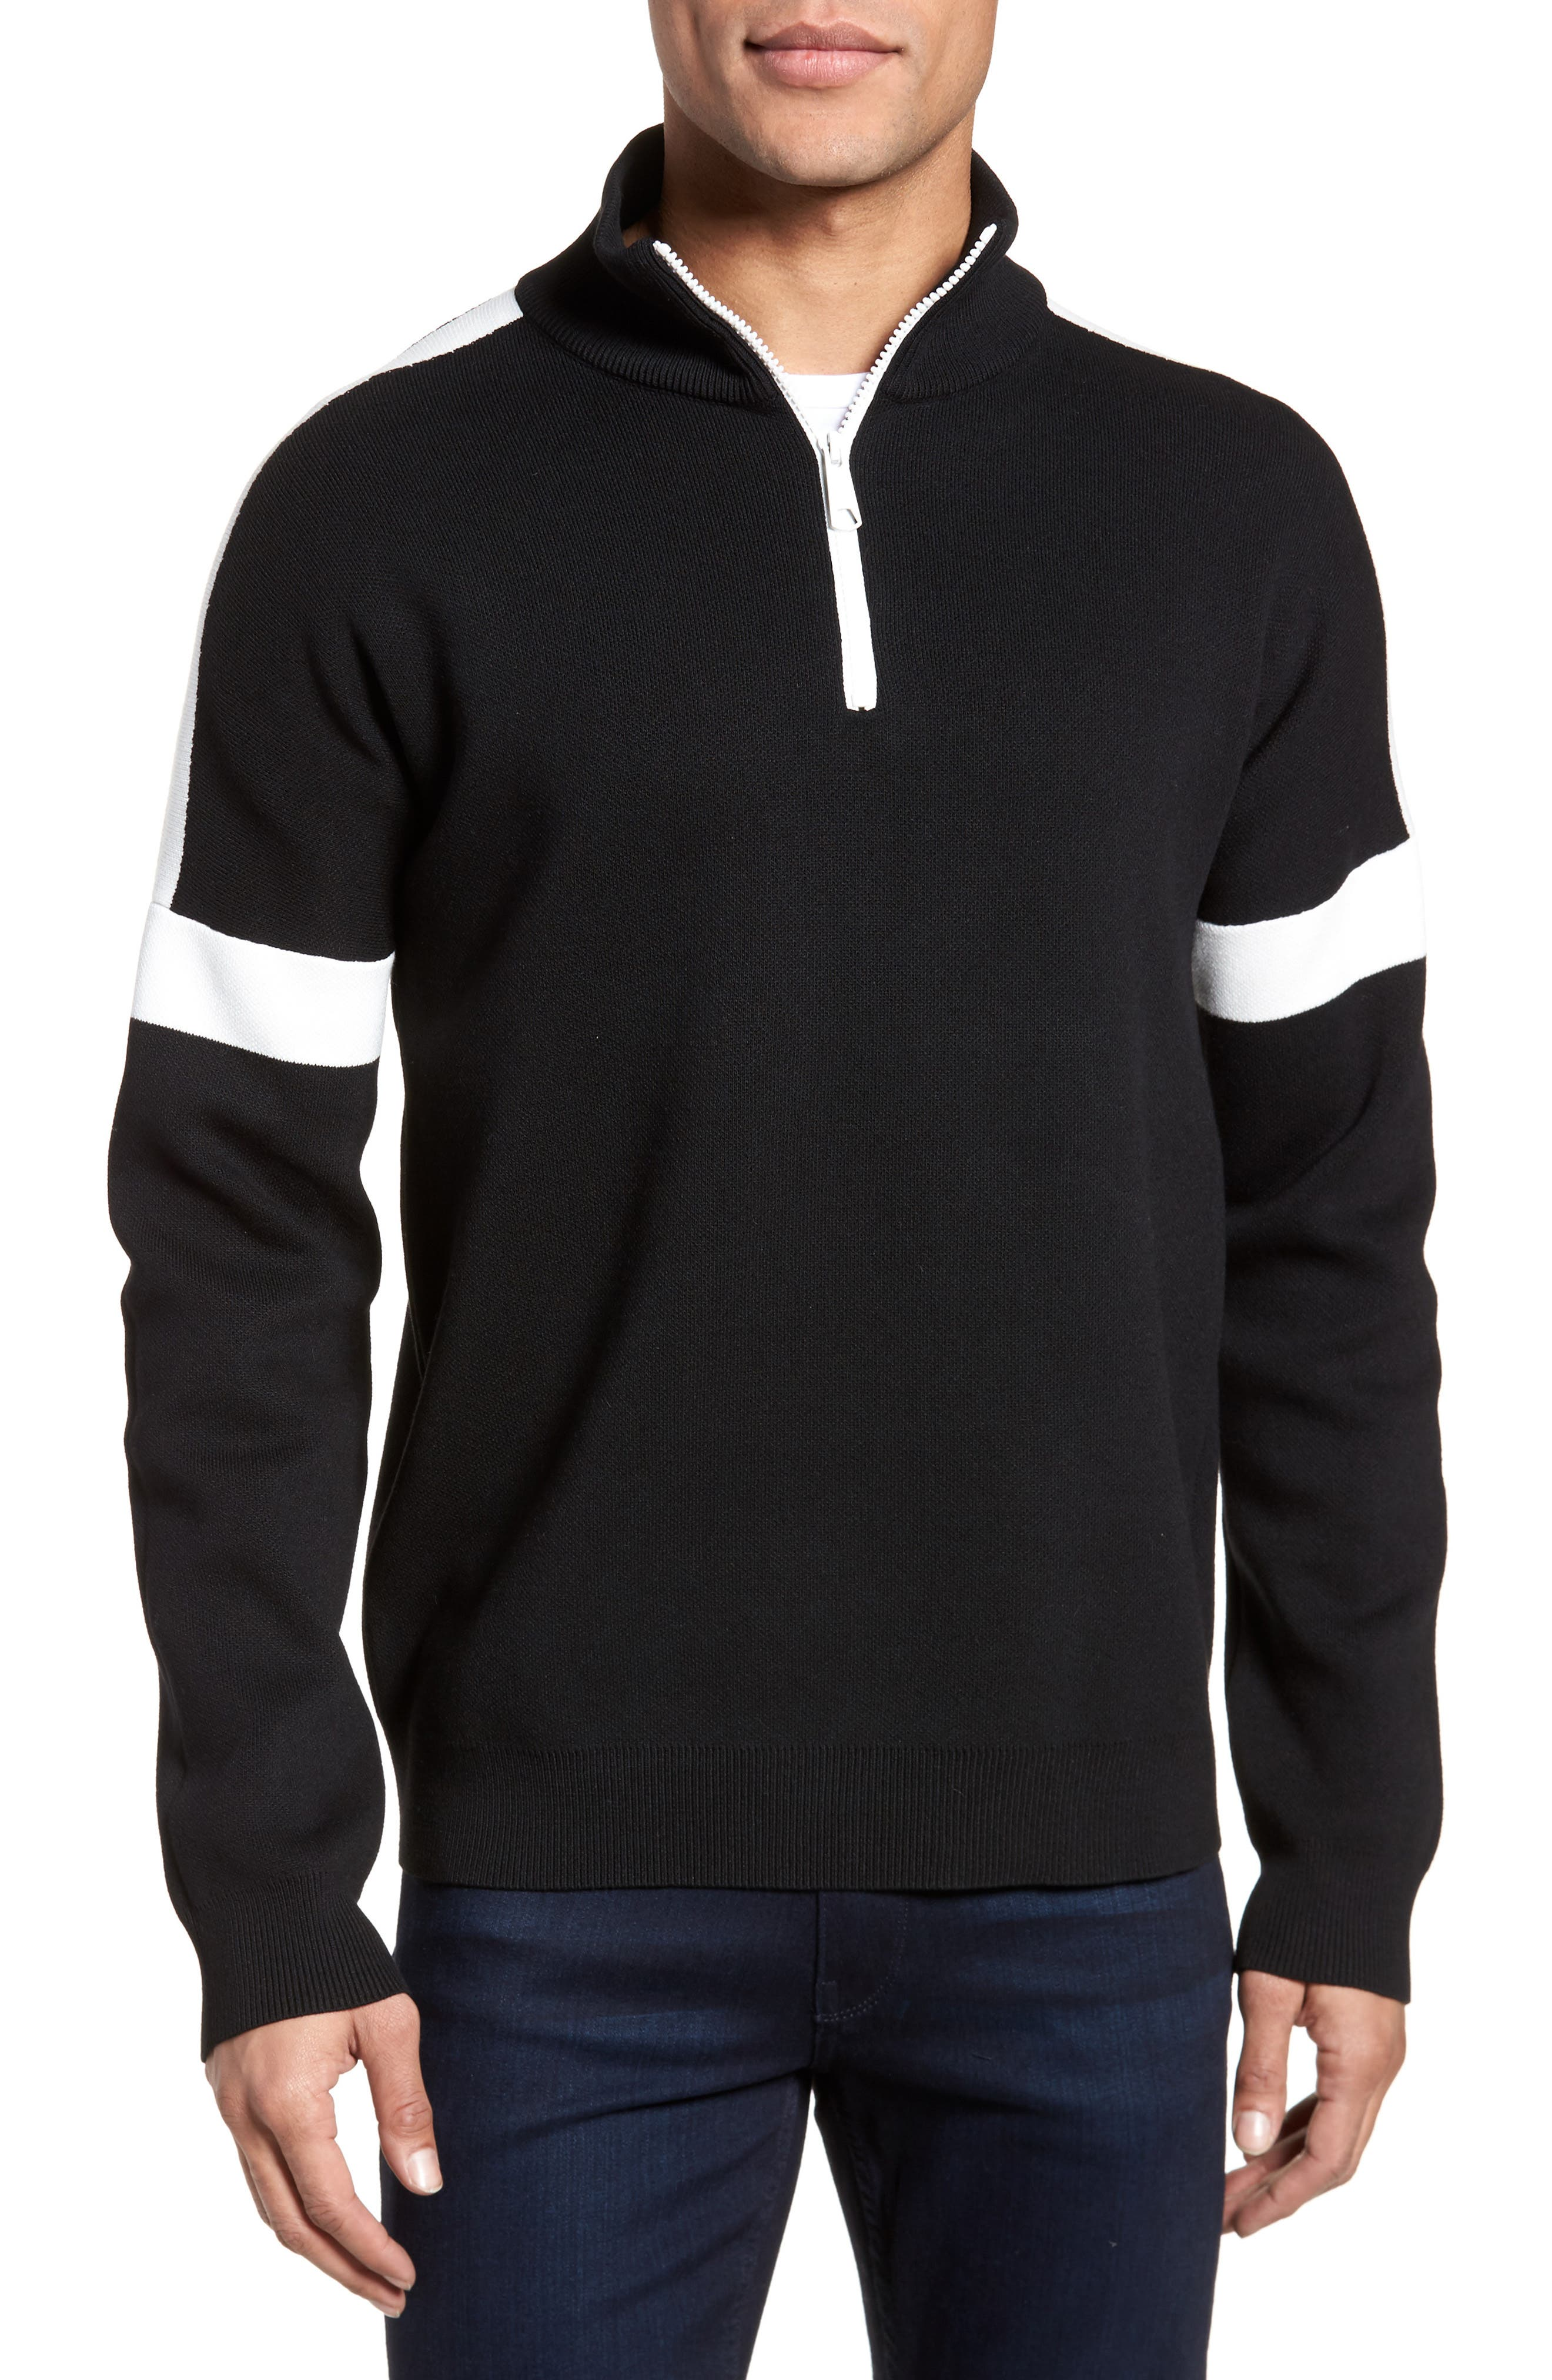 Lakra Regular Fit Half Zip Pullover,                         Main,                         color, Black/Milk/Black